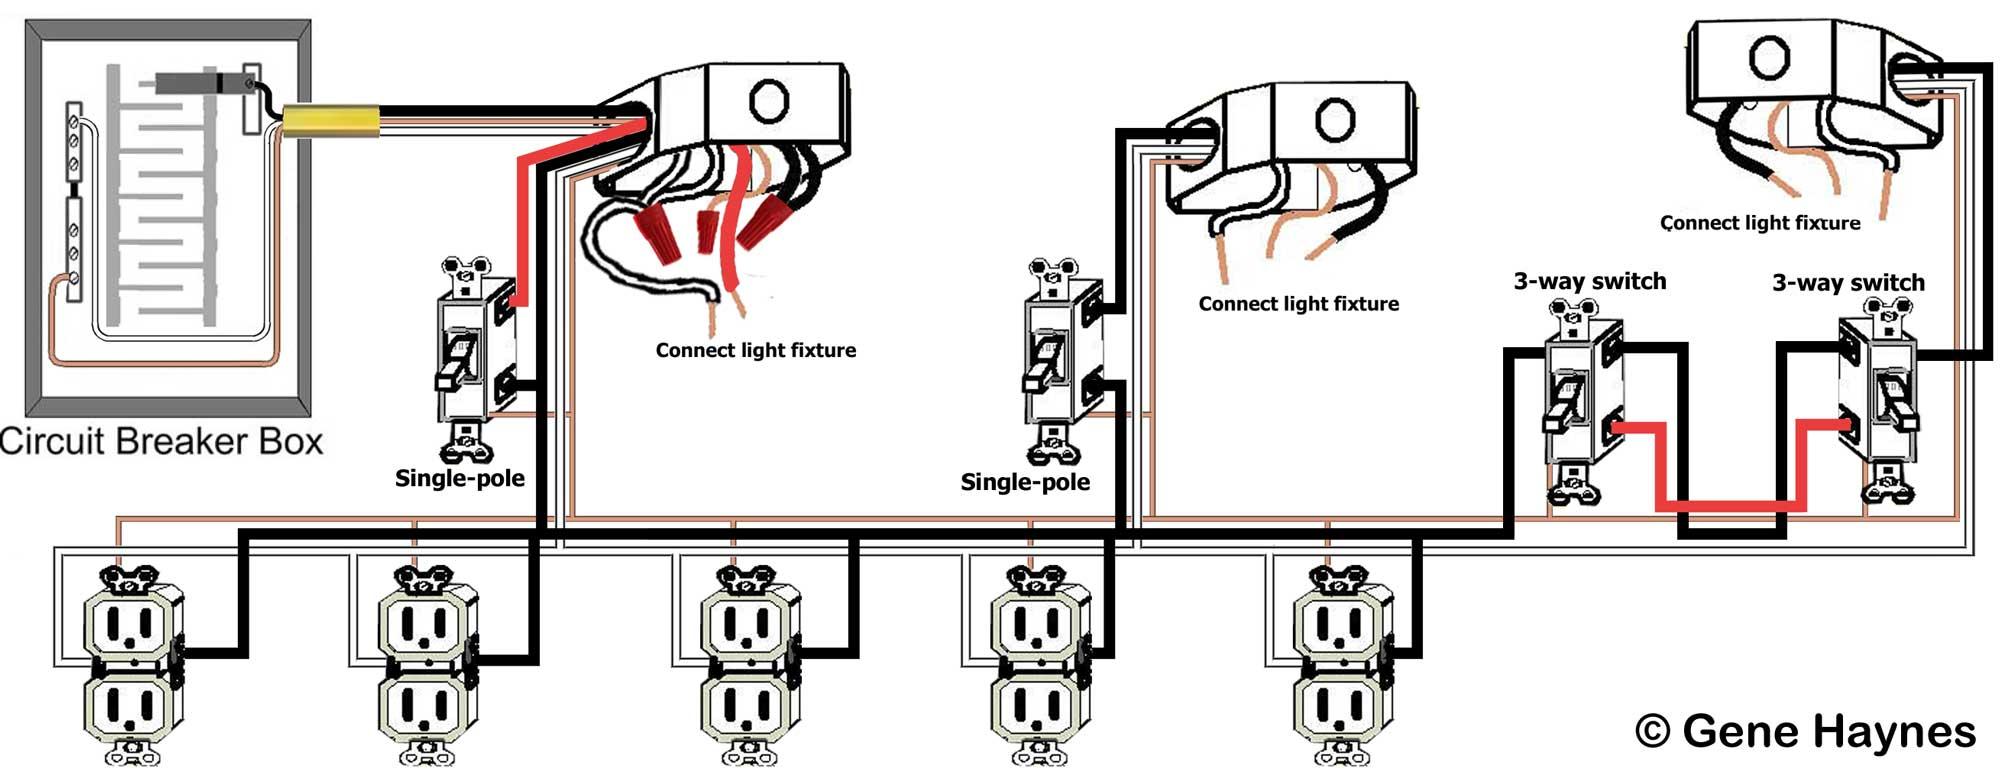 Basic Home Wiring Guide - Data Wiring Diagram Detailed - Basic House Wiring Diagram